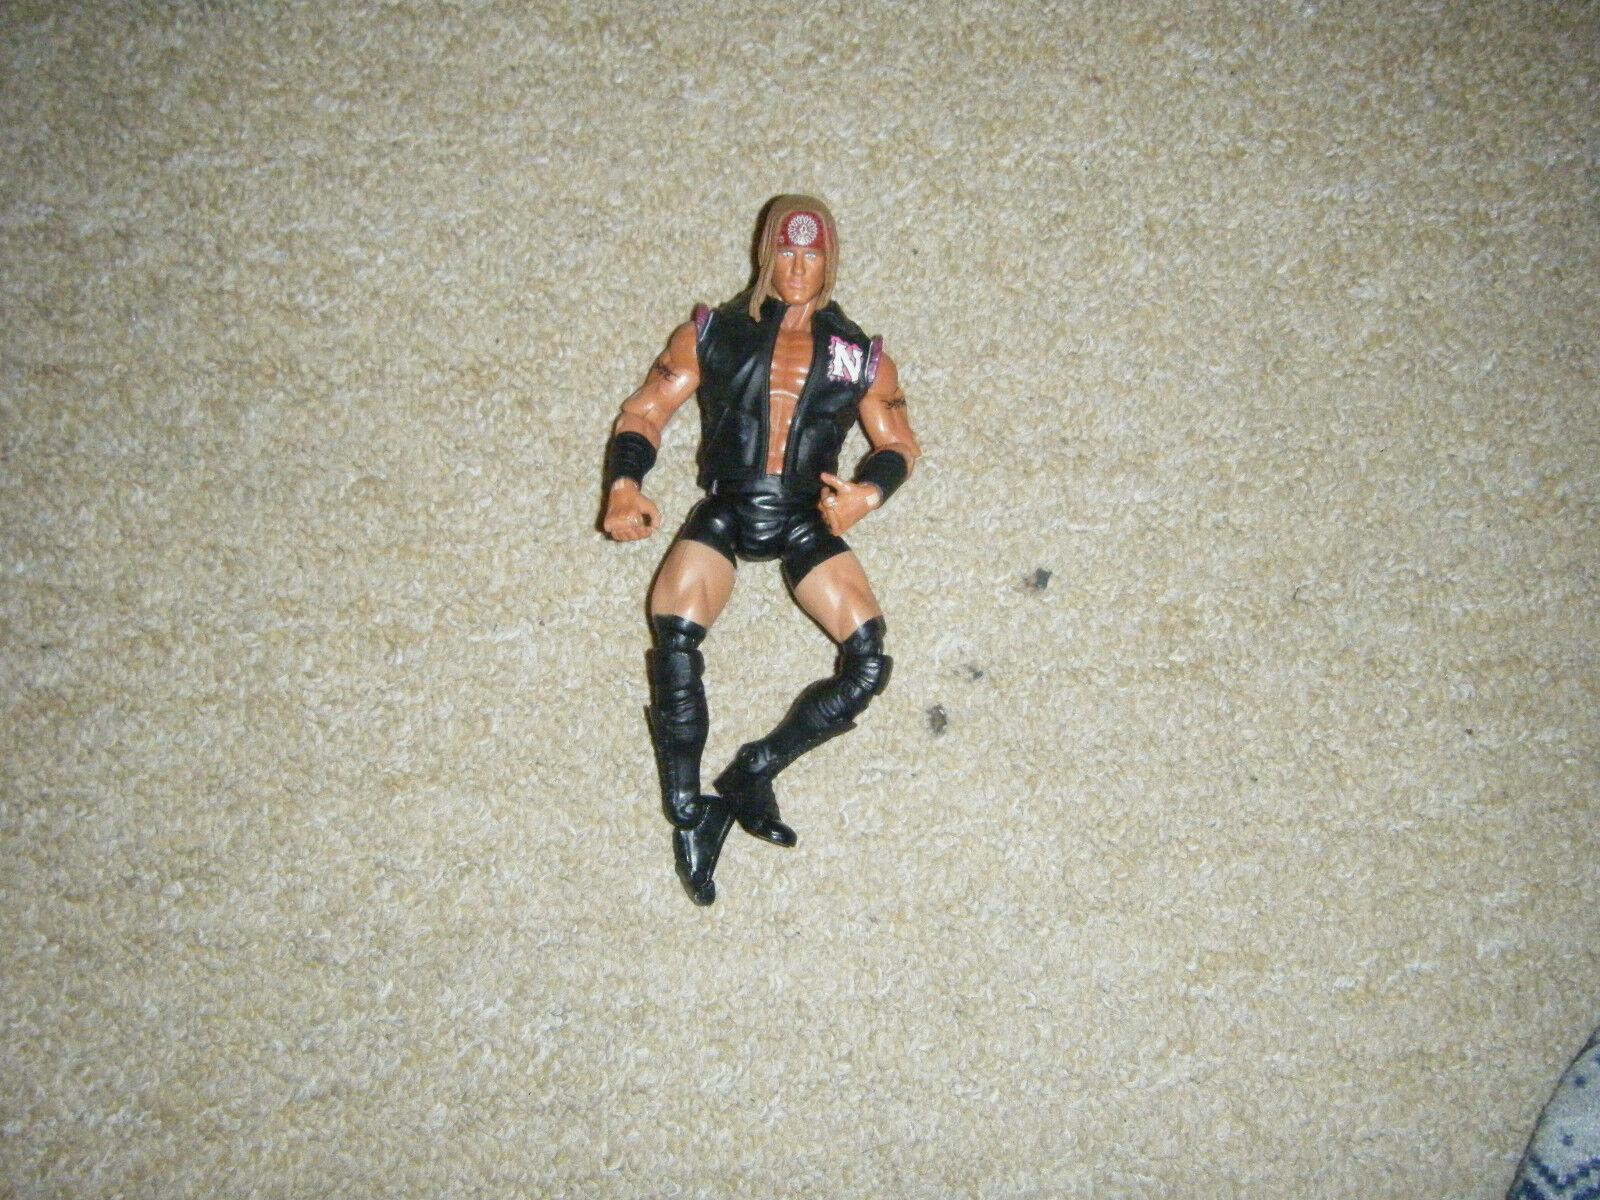 TNA MARVEL FIGURINE CATCHEUR ELITE DE LUXE BASIQUE WWE WWE WWE FIGURINE SUPERSTARS 114146